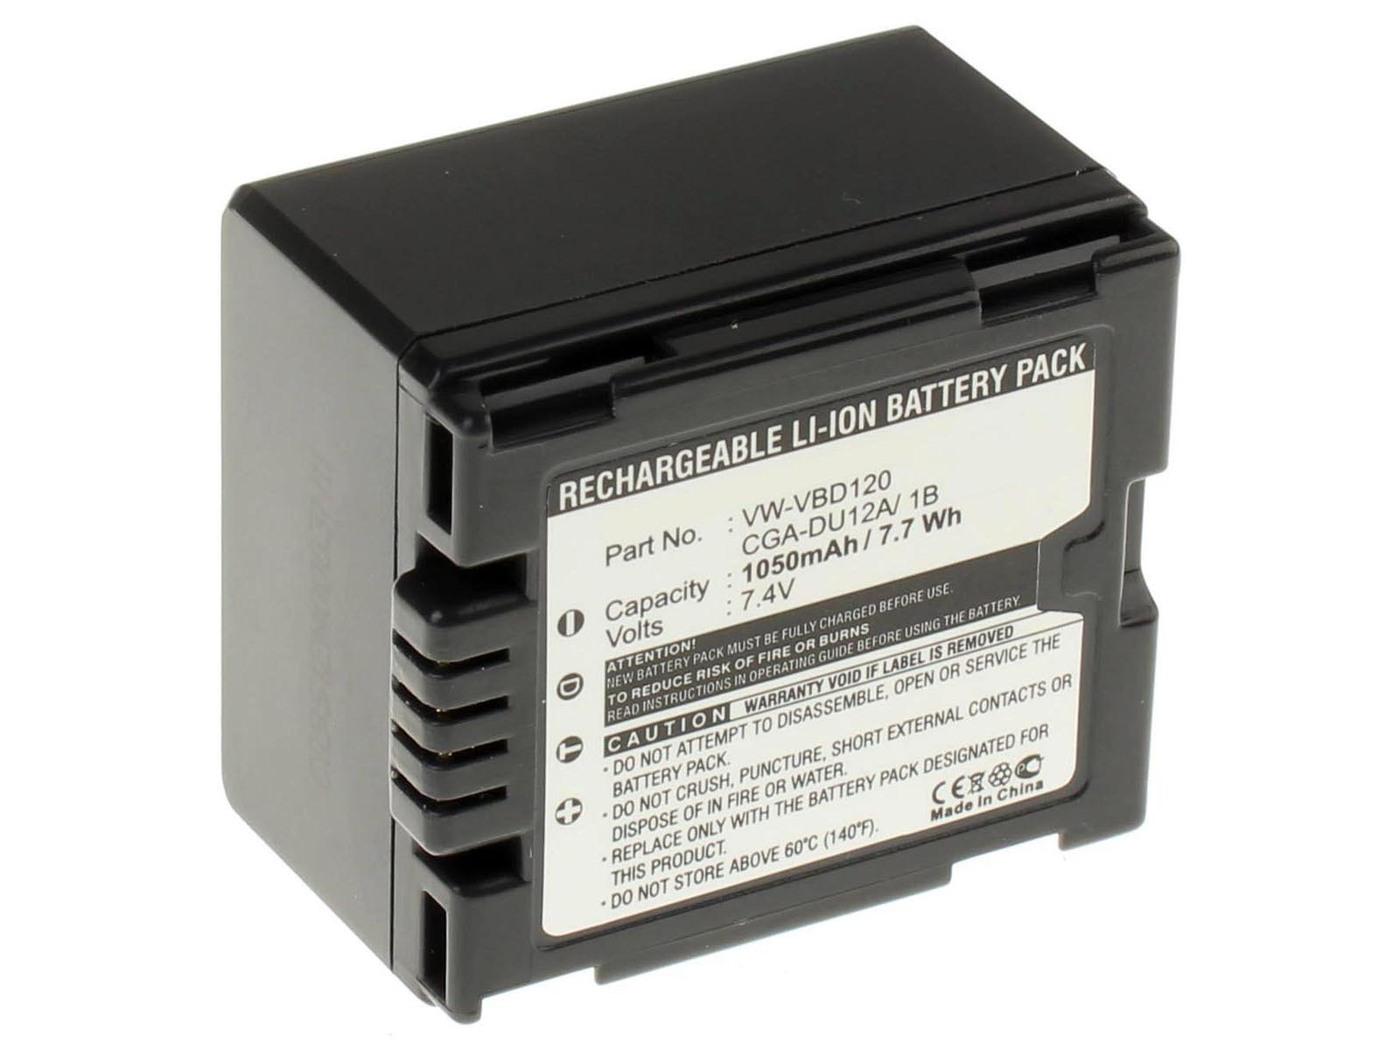 Аккумуляторная батарея iBatt iB-T1-F459 1050mAh для камер Hitachi DZ-MV350E, DZ-MV730E, DZ-BD70, DZ-GX3100E, DZ-MV380, DZ-BD7H, DZ-MV750E,  для Panasonic NV-GS27, NV-GS300, NV-GS400, NV-GS500, NV-GS35, SDR-H280, NV-GS6, SDR-H20, NV-GS230, NV-GS180